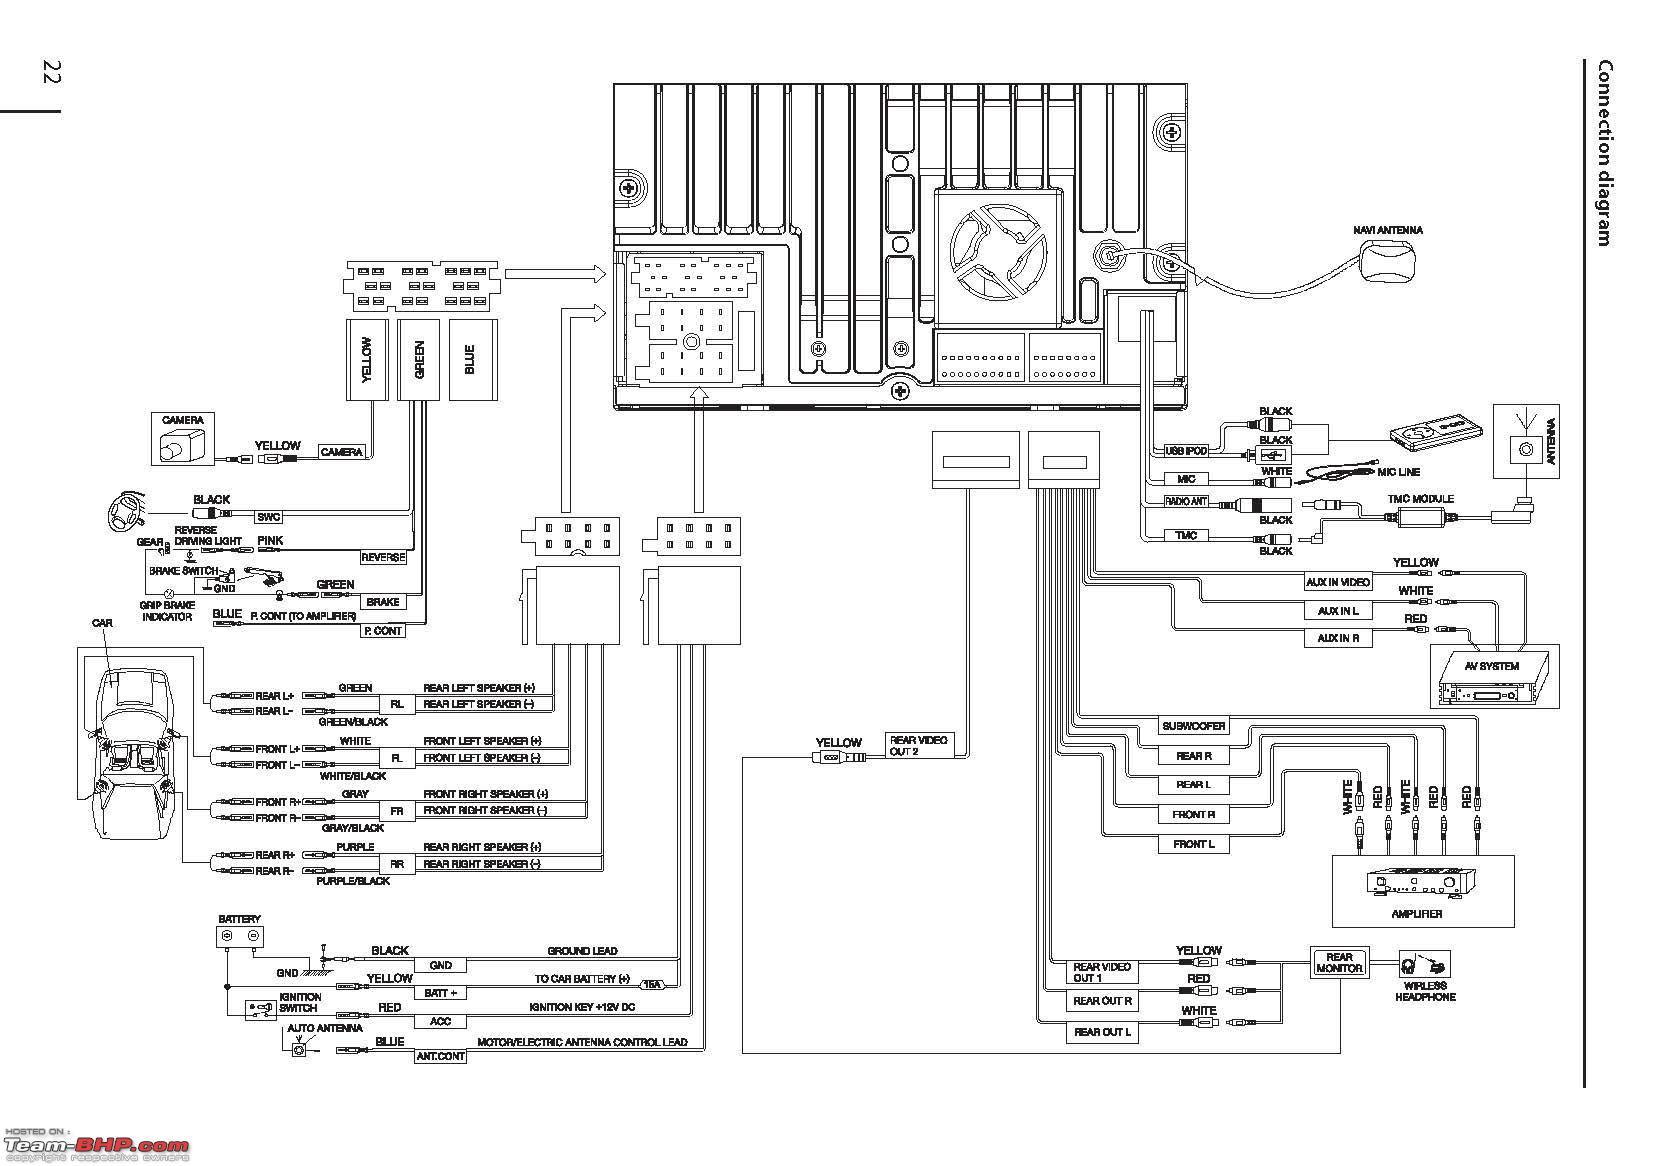 memphis audio wiring diagrams fluorescent emergency ballast diagram sony car stereo pinterest